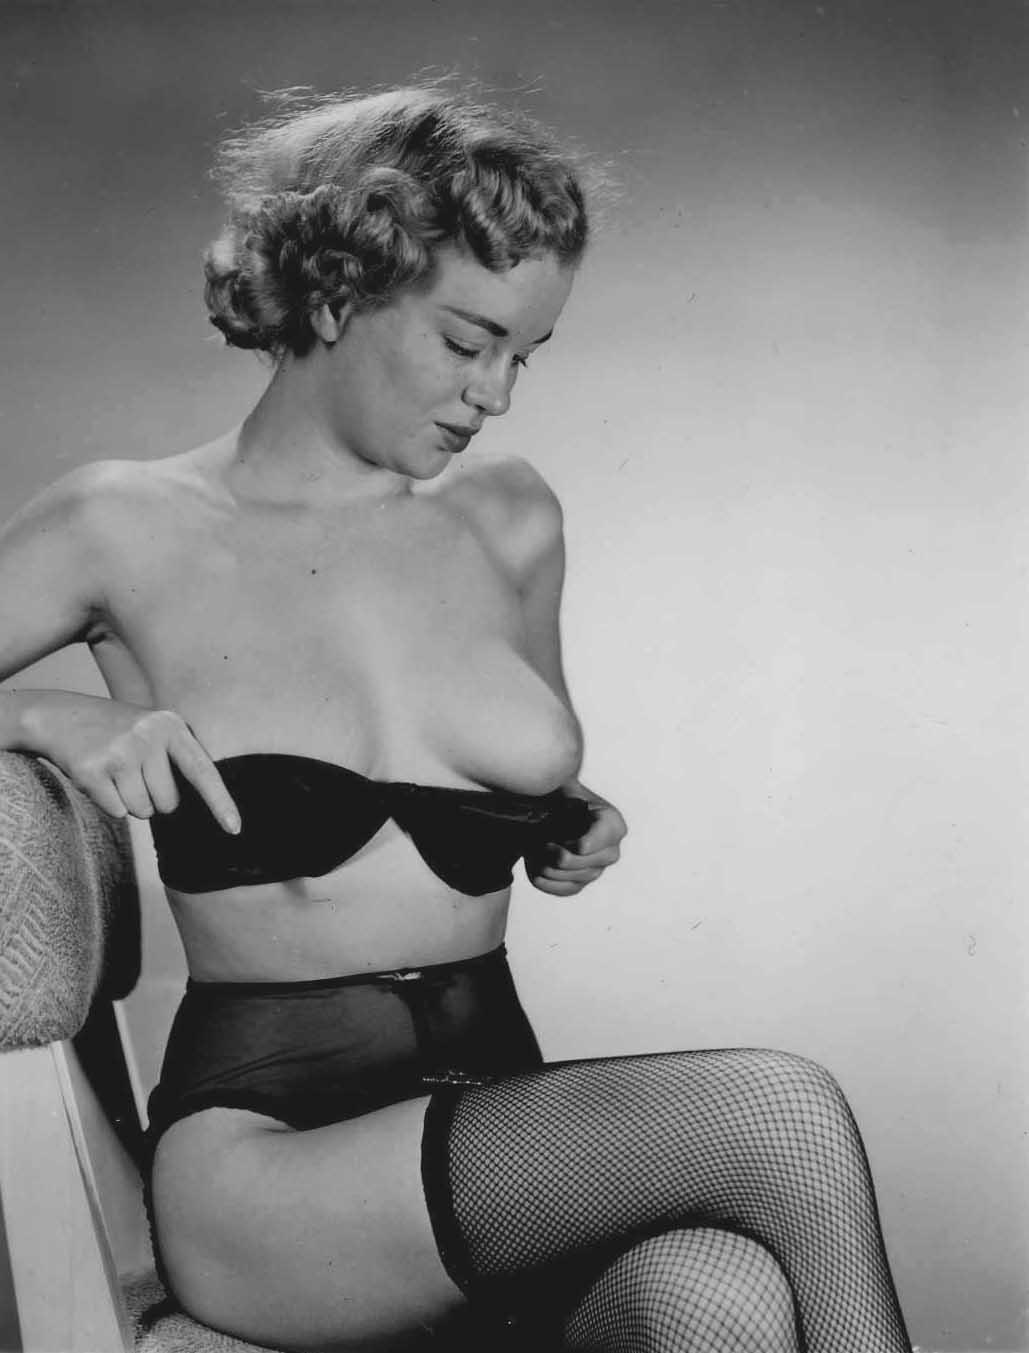 Arlene dickinson nude, porns world records